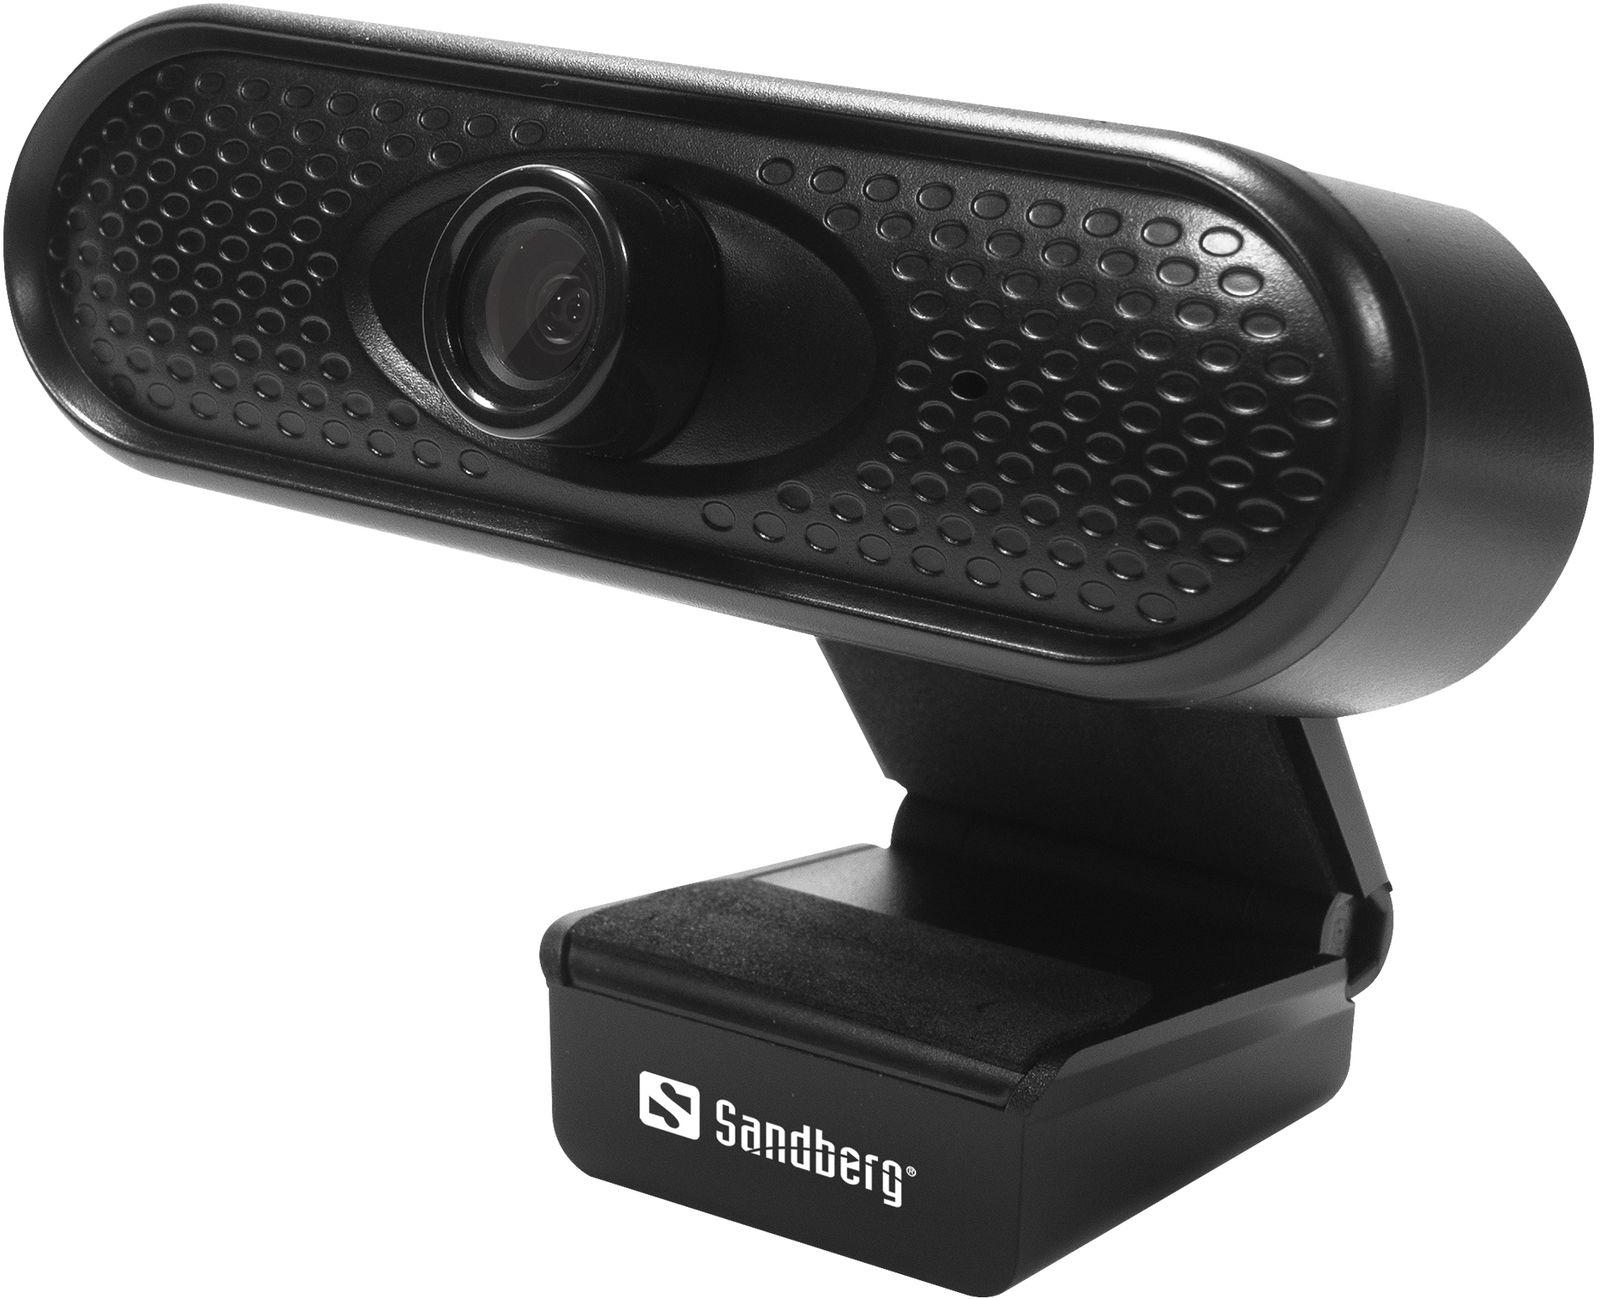 Sandberg USB Webcam 1080P HD USB Webcam 1080P HD, 2 MP,  133-96 - eet01